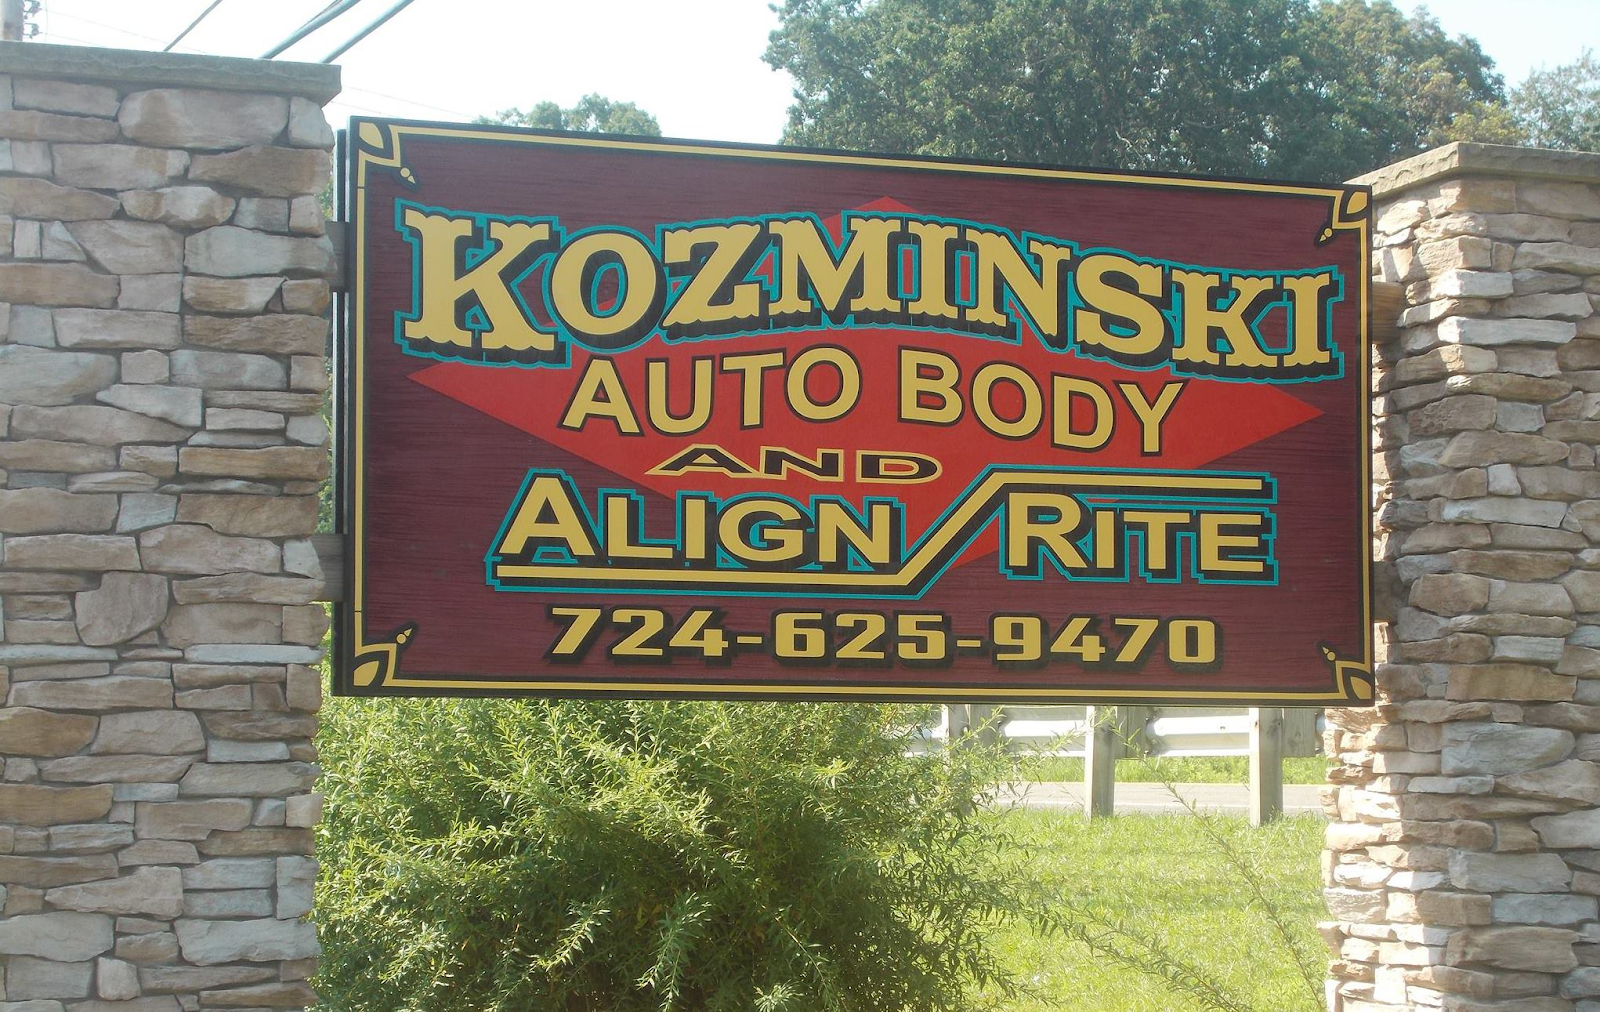 Kozminski Auto Body